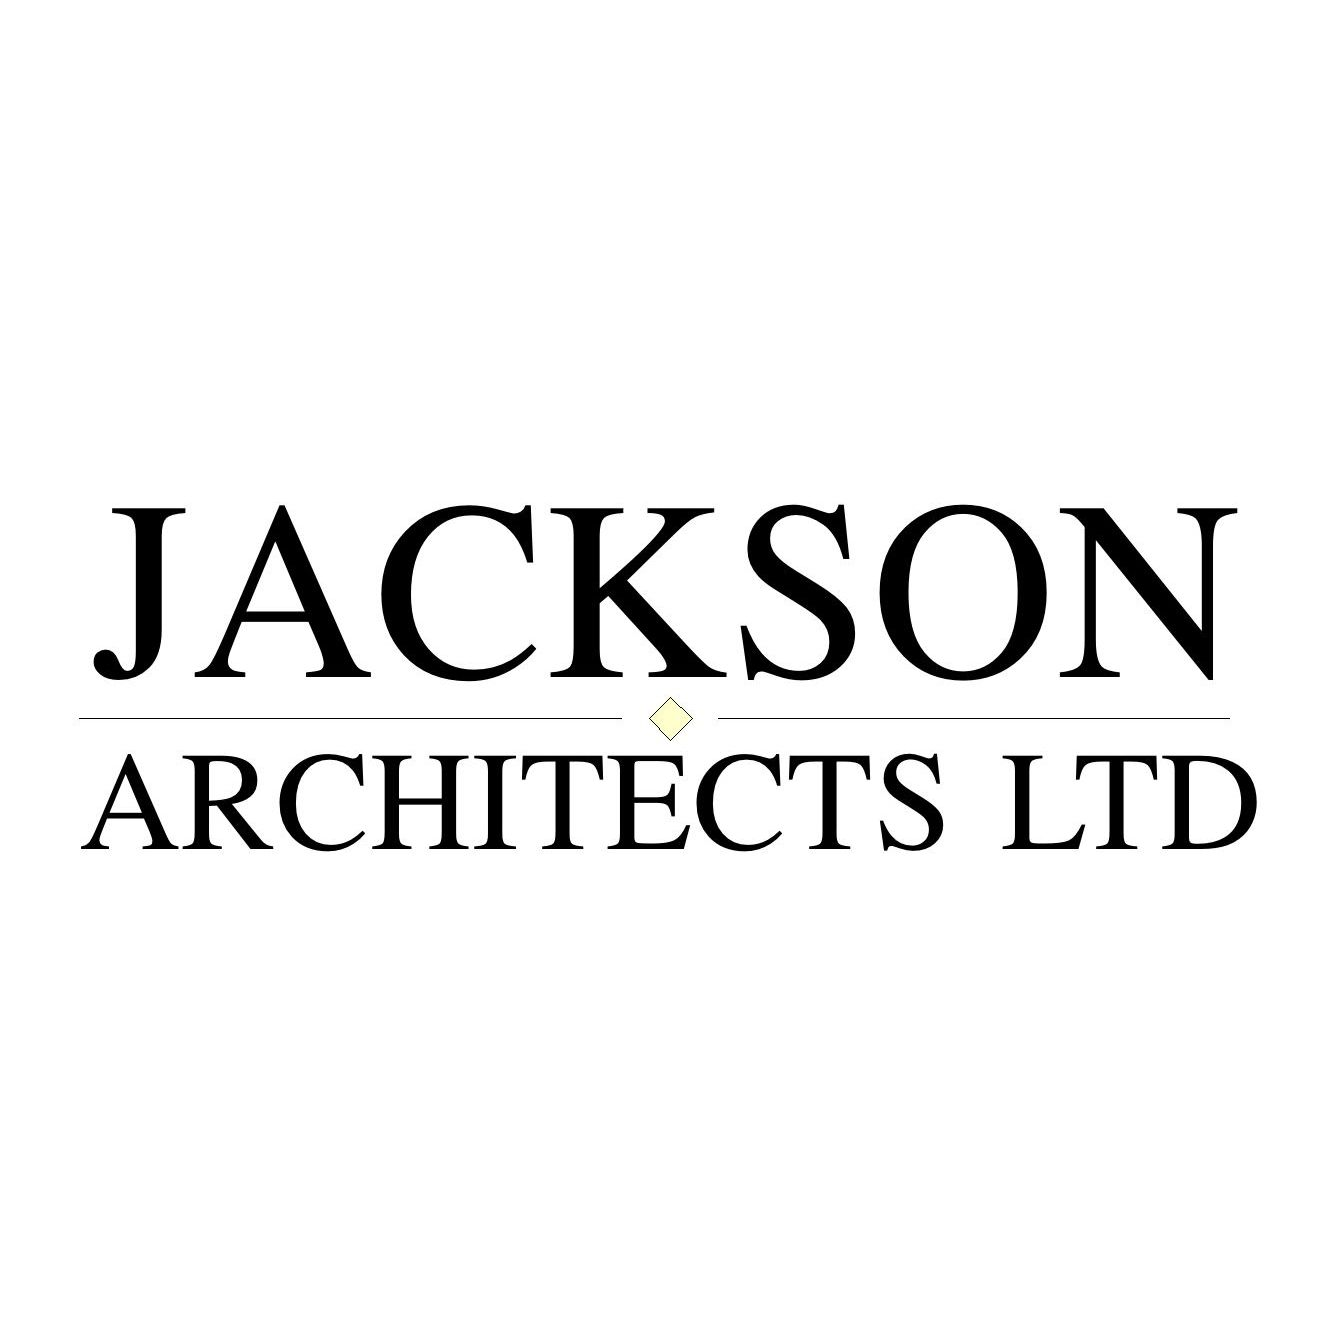 Jackson Architects Ltd - Taunton, Somerset TA1 3SX - 01823 443742 | ShowMeLocal.com